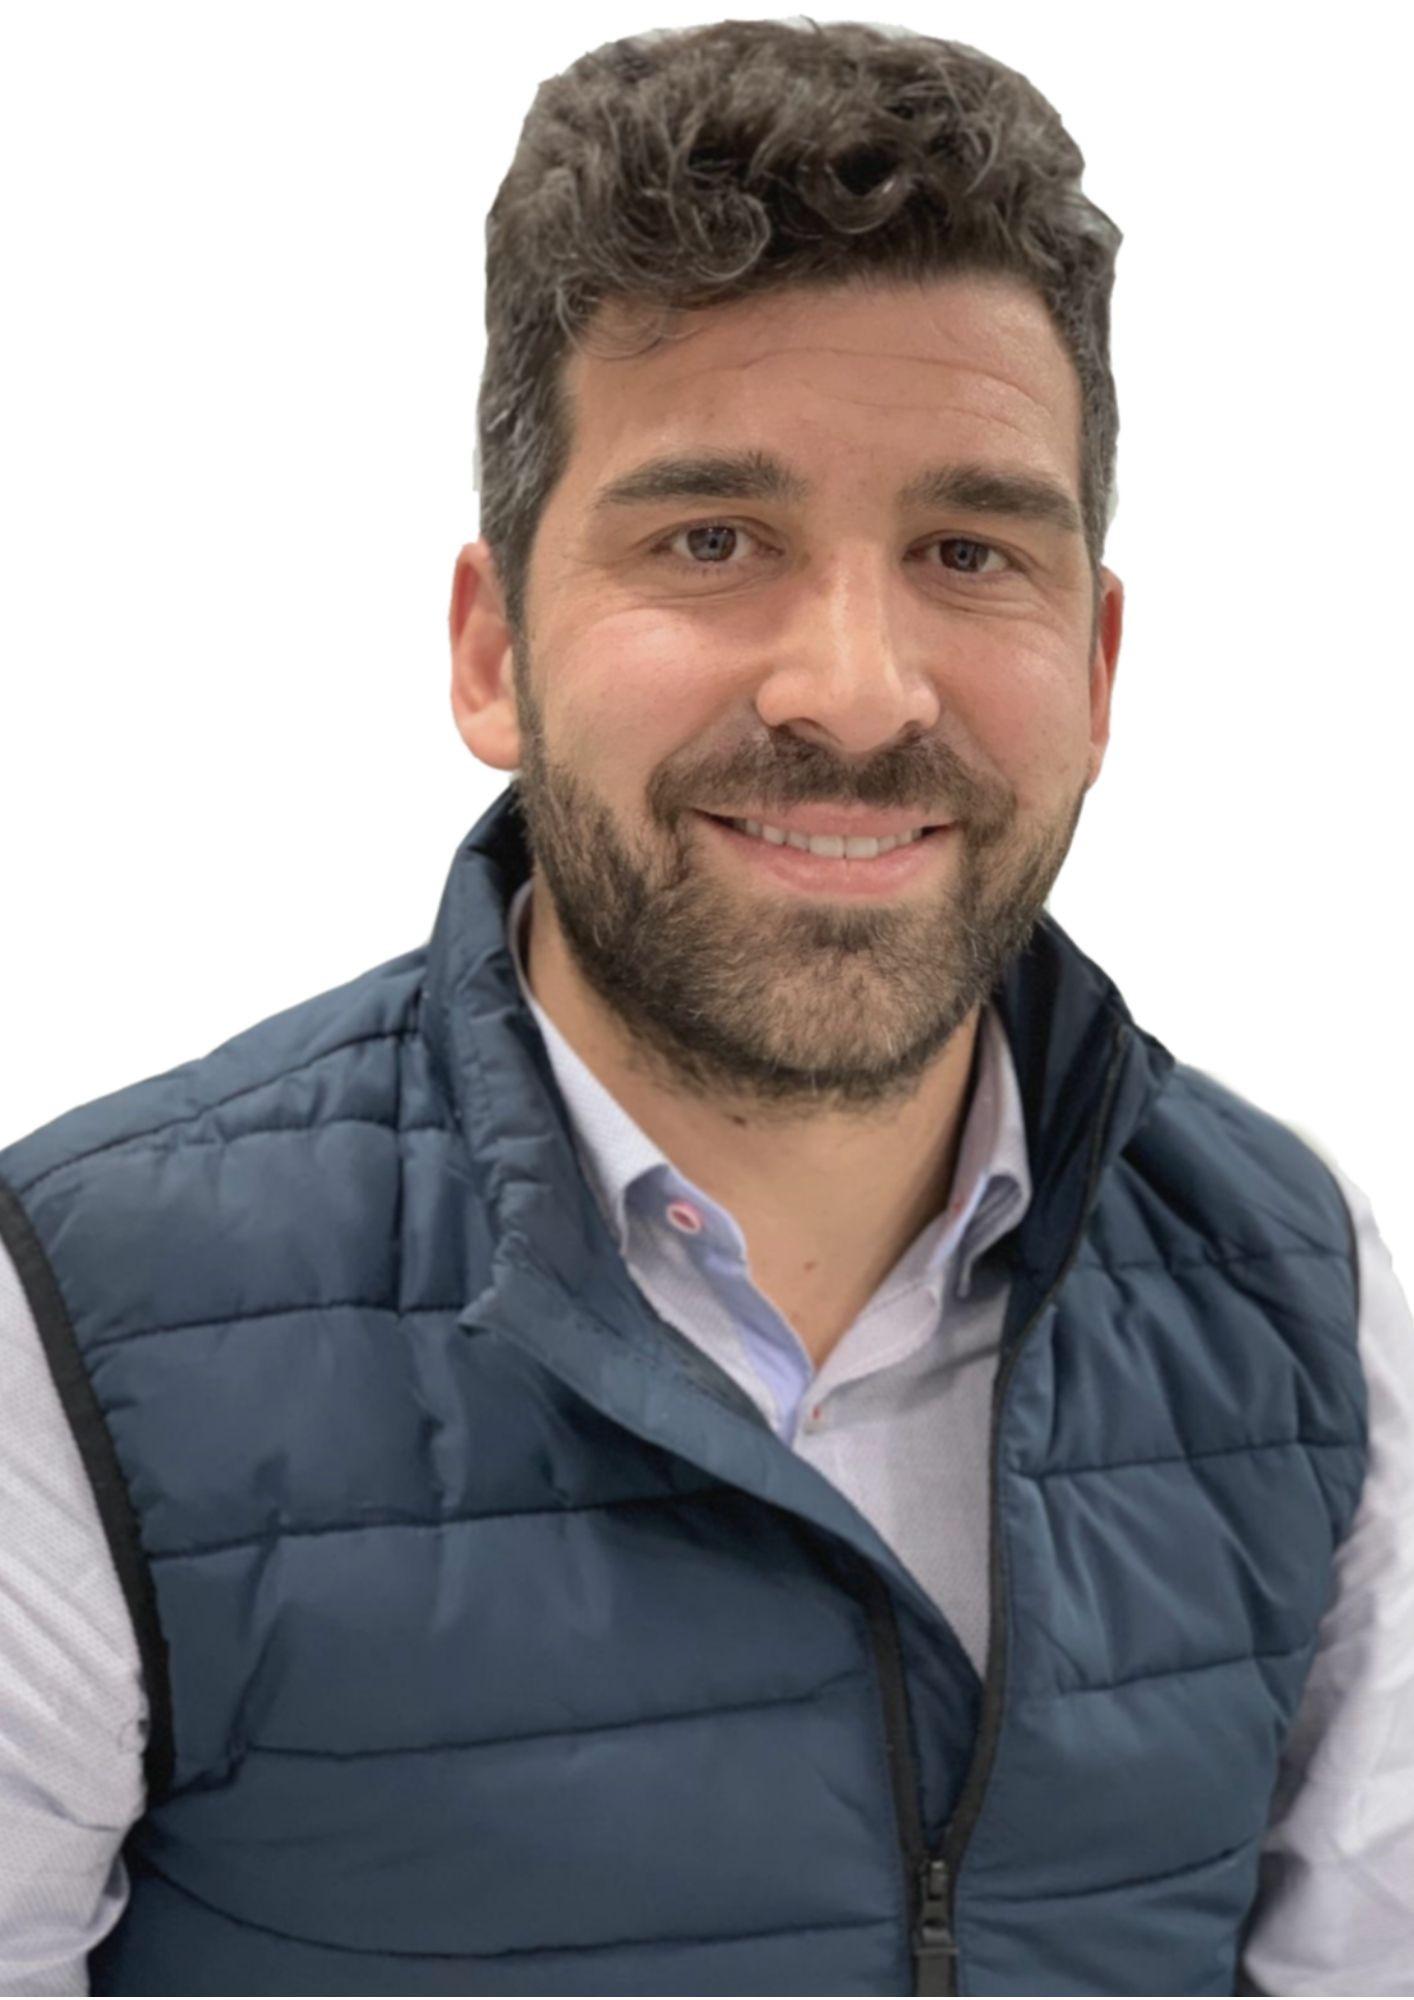 Victor Escorihuela Calvo